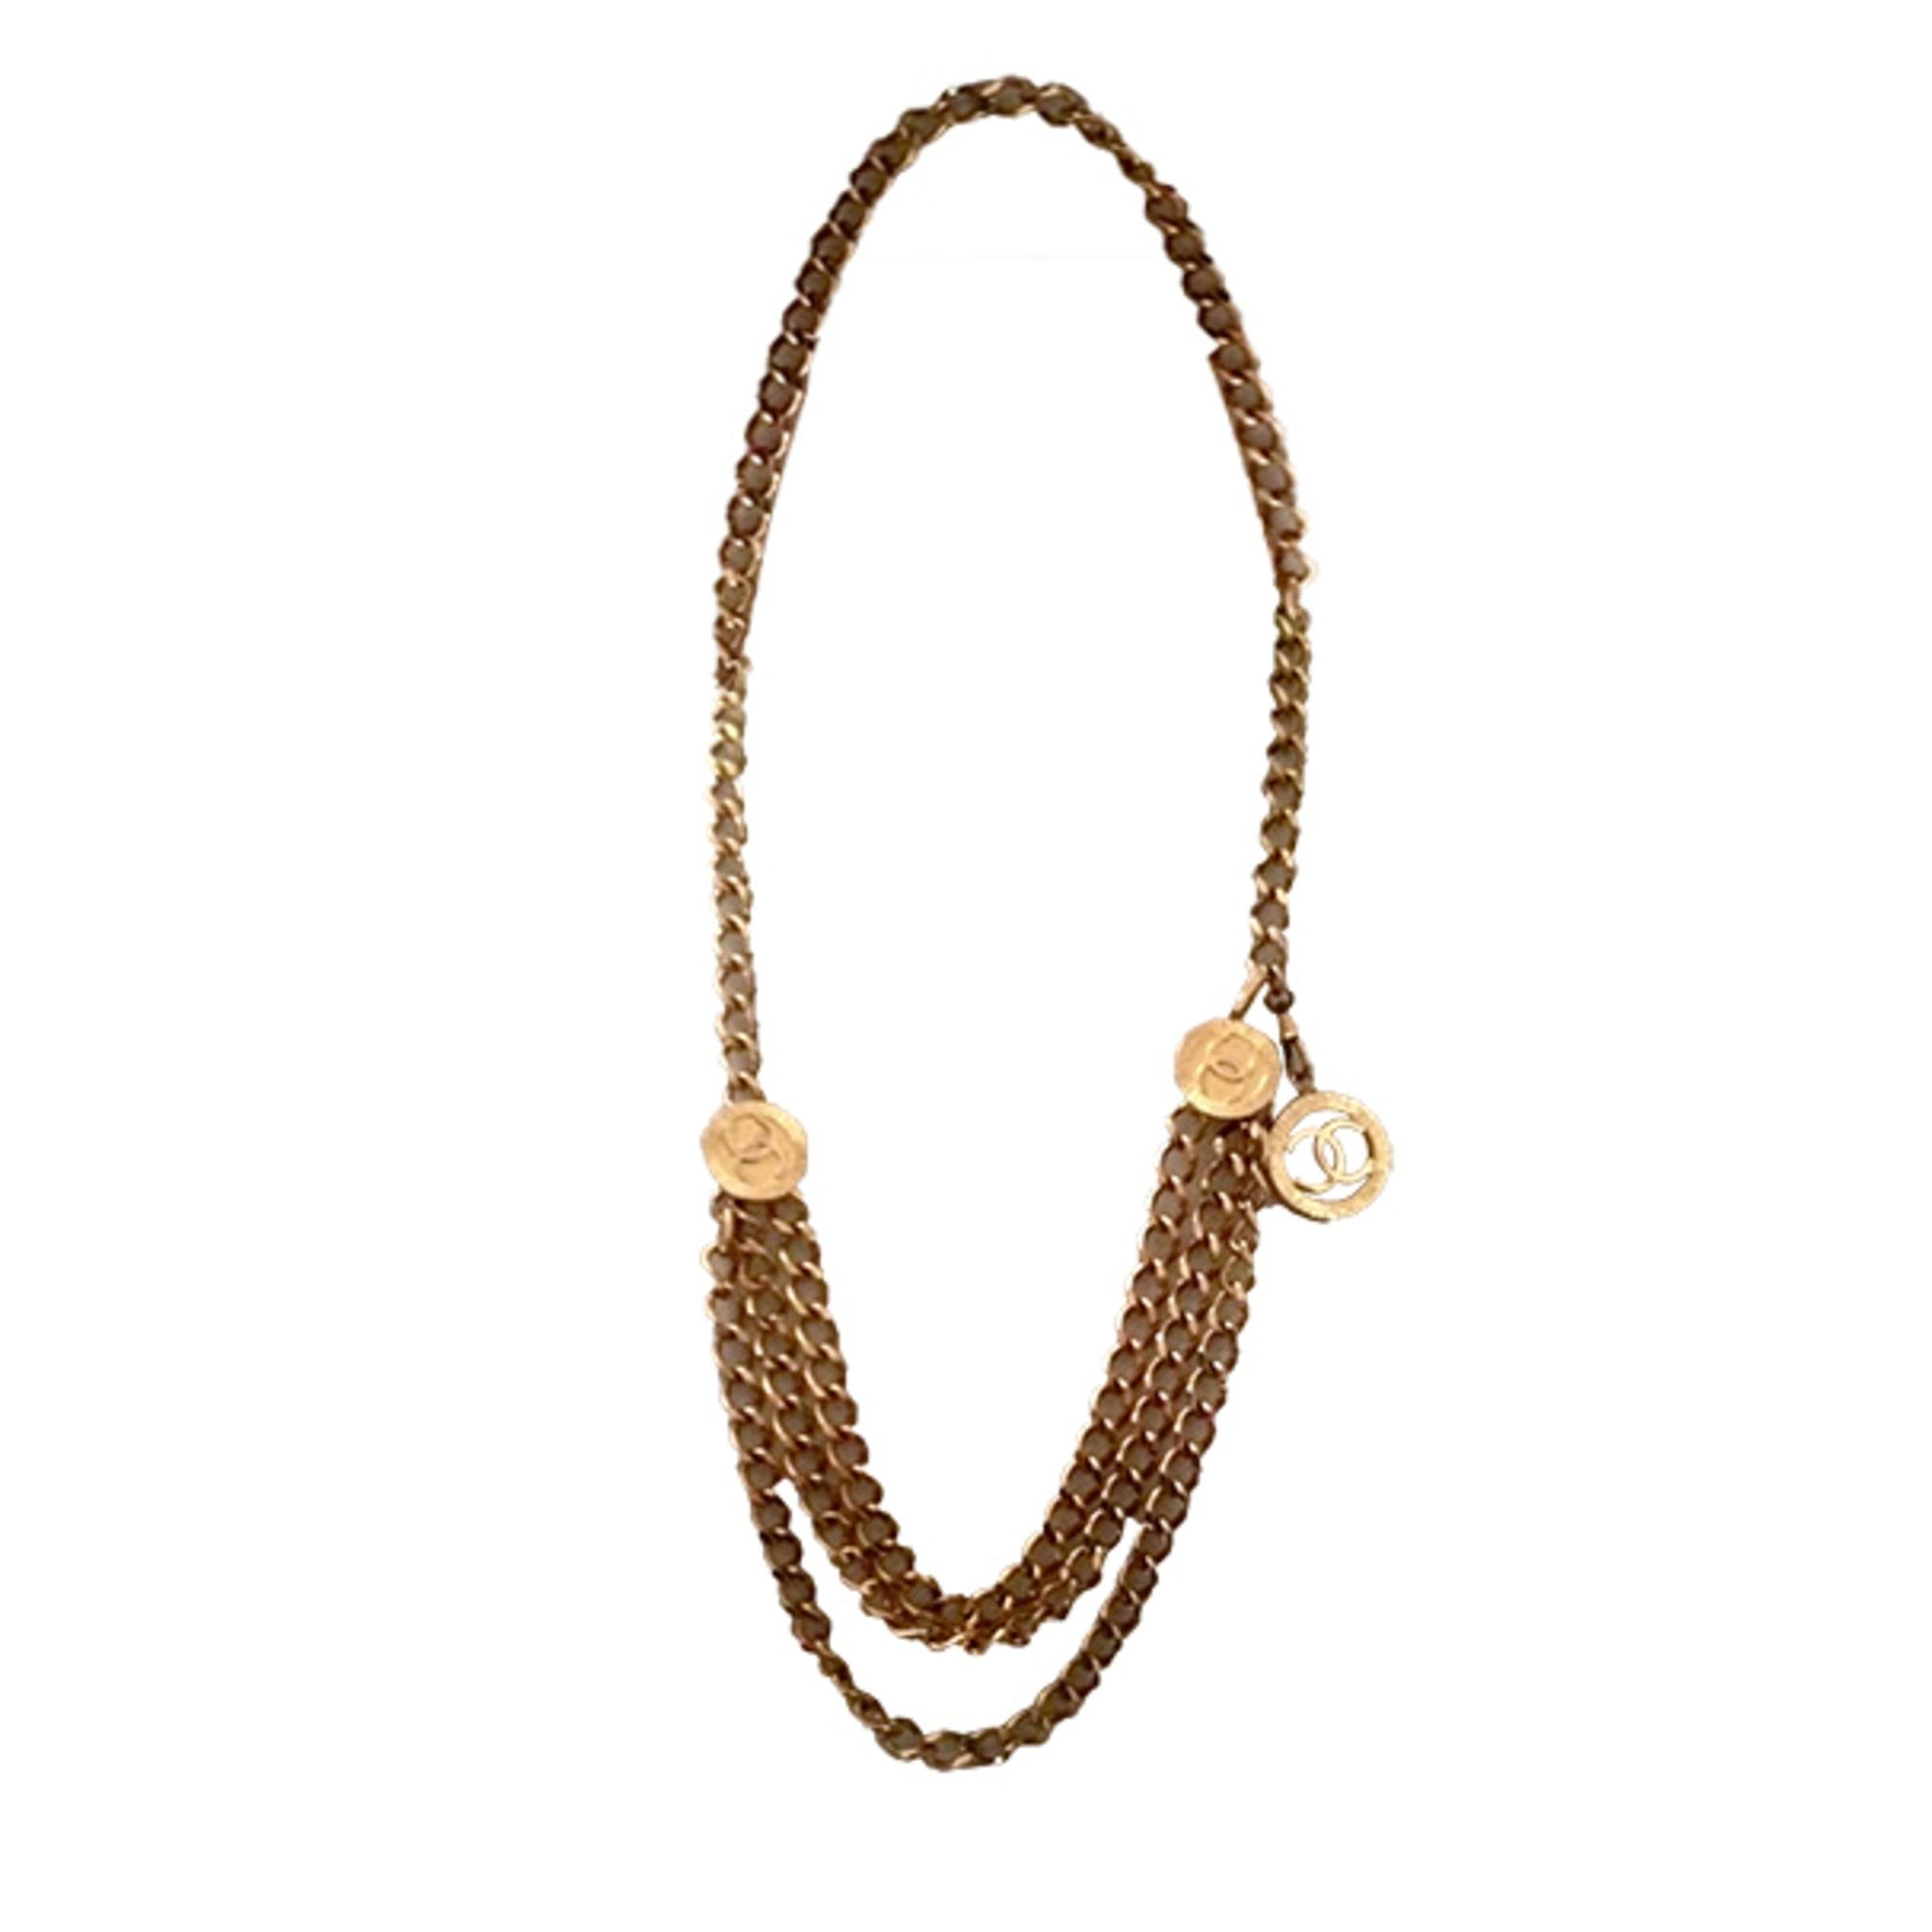 Kette CHANEL Gold, Bronze, Kupfer